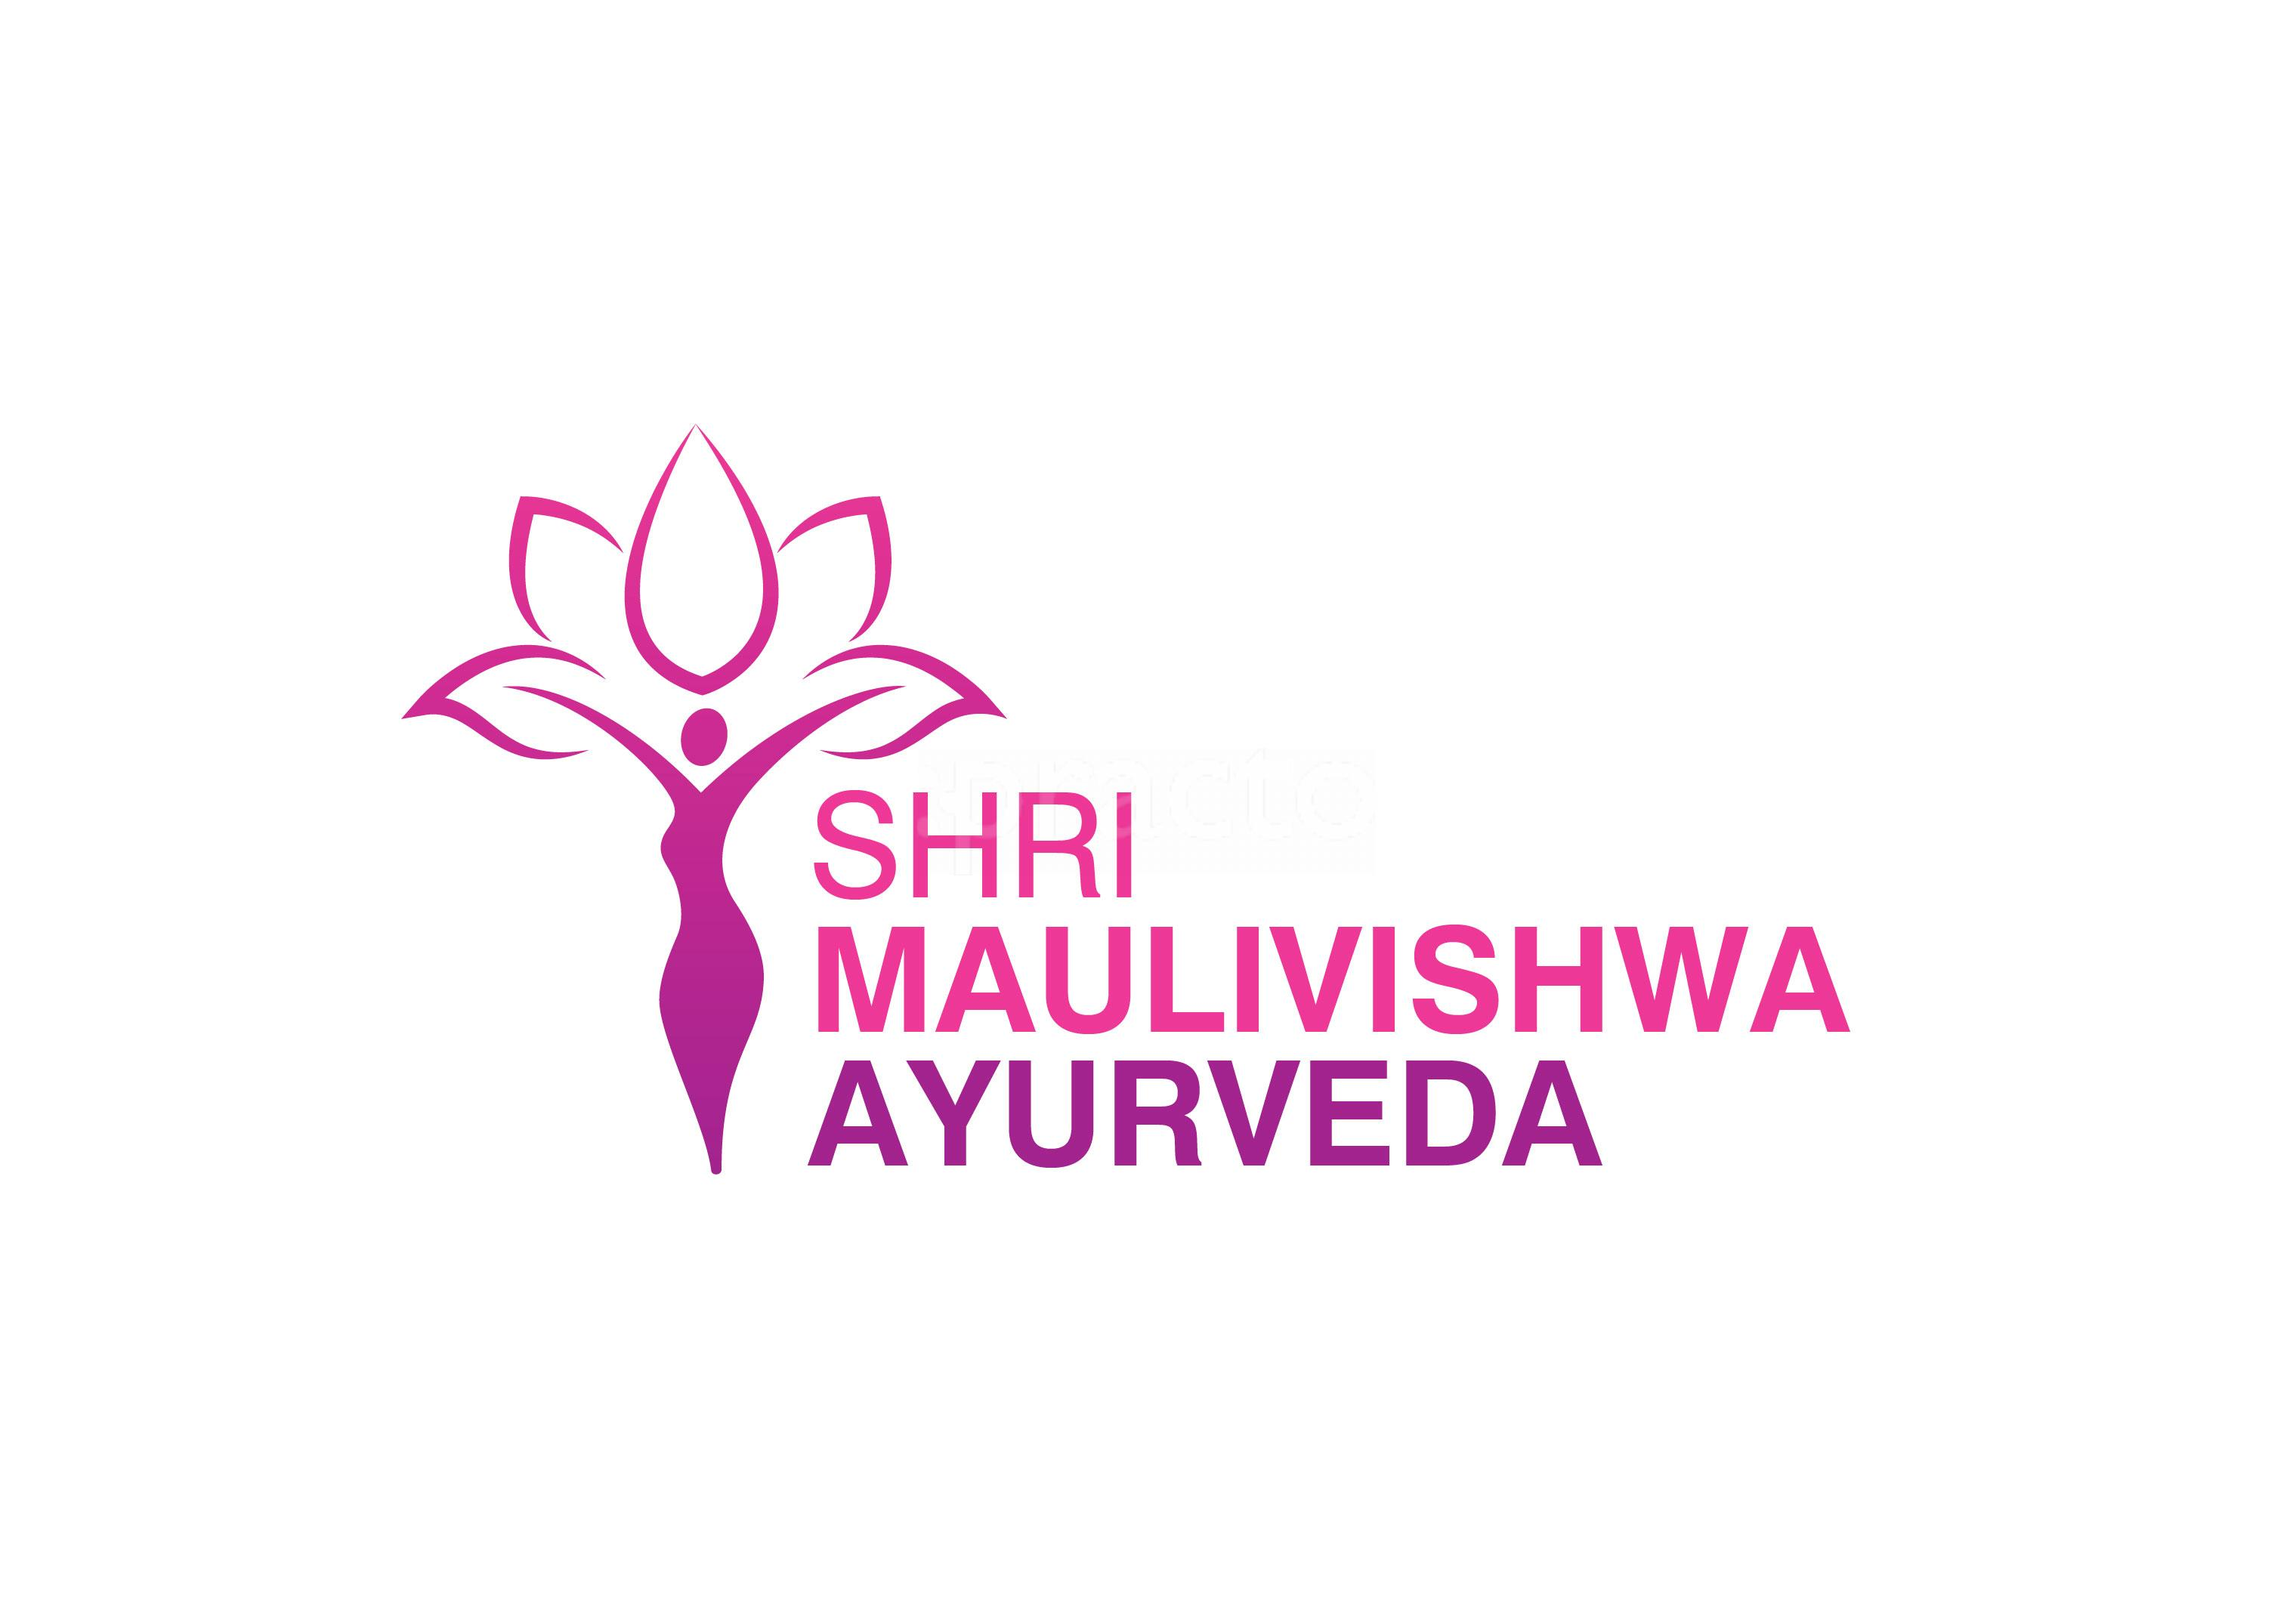 Shri Maulivishwa Ayurveda